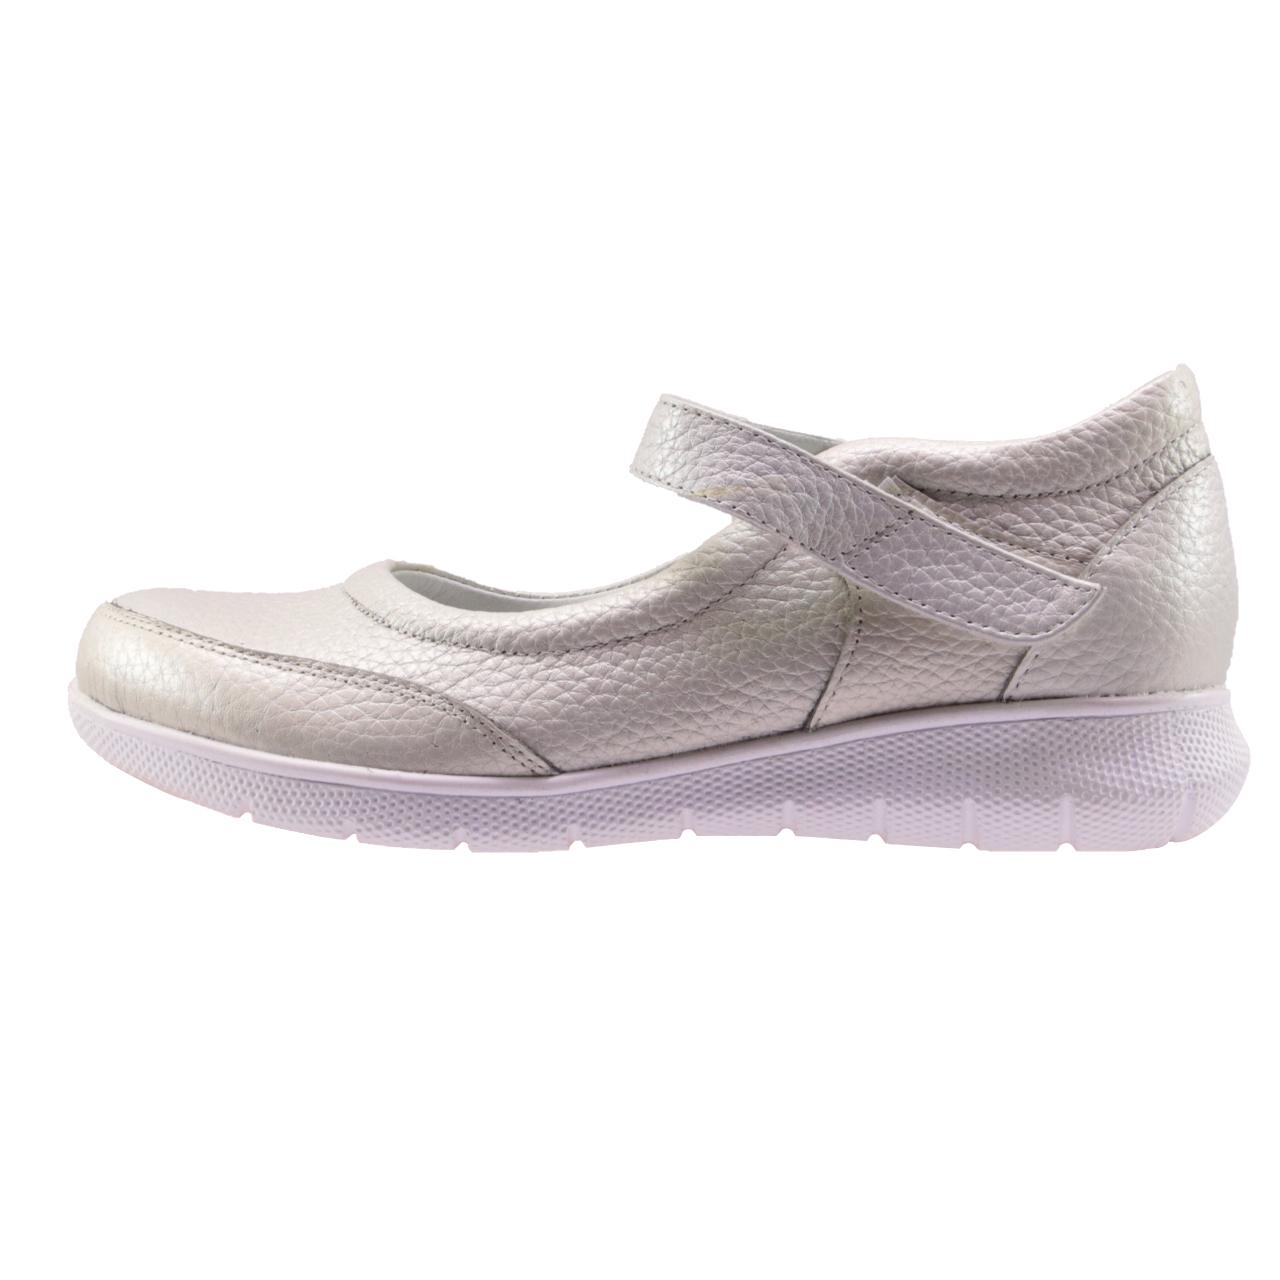 کفش روزمره زنانه پاتکان کد 5099